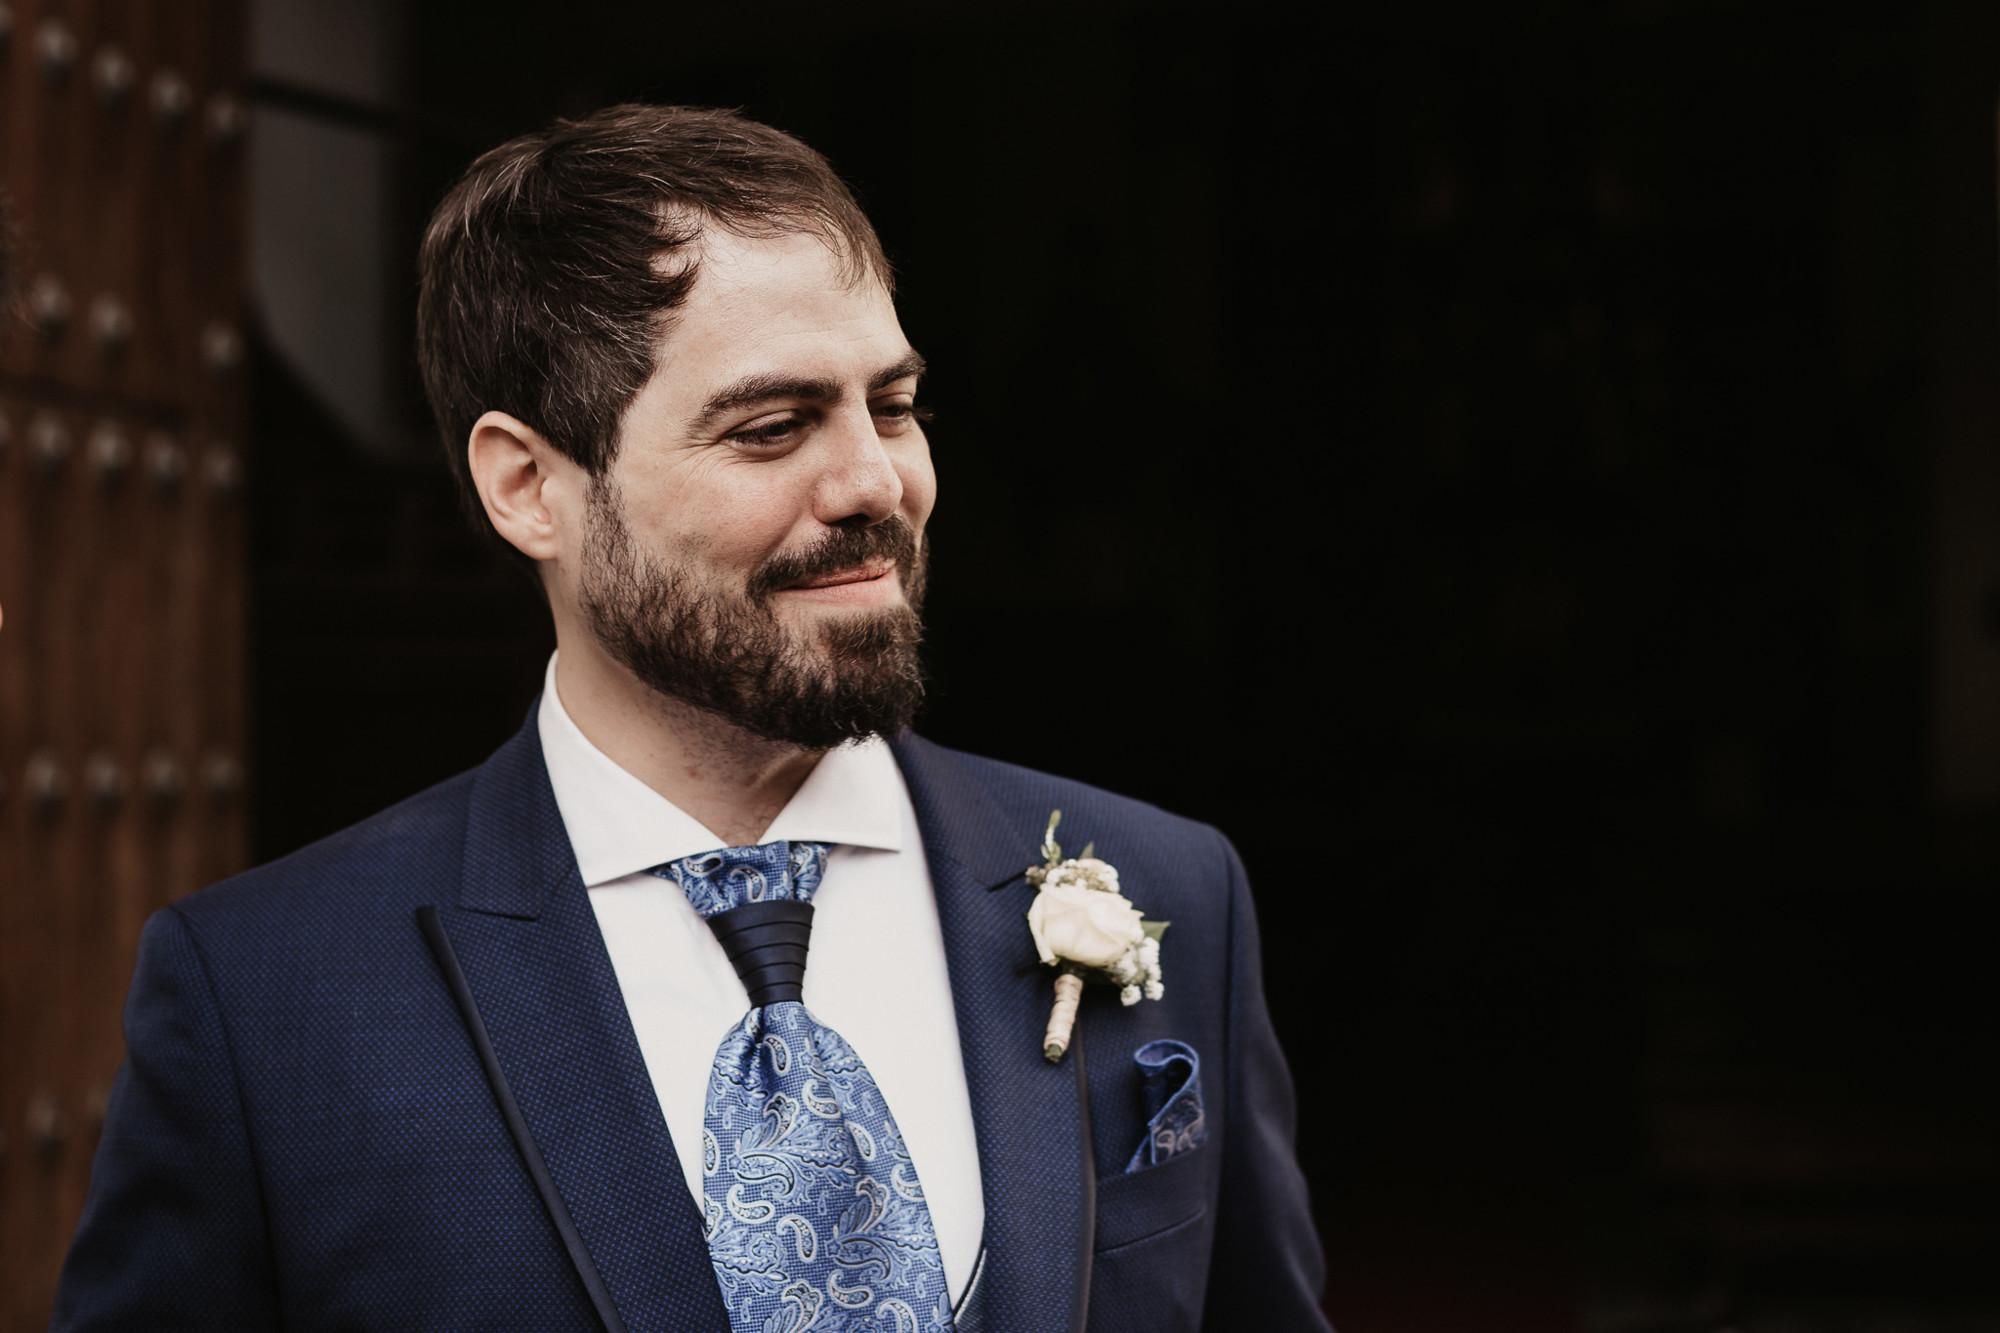 fotógrafo-boda-cádiz-el-creador-de-recuerdos-45